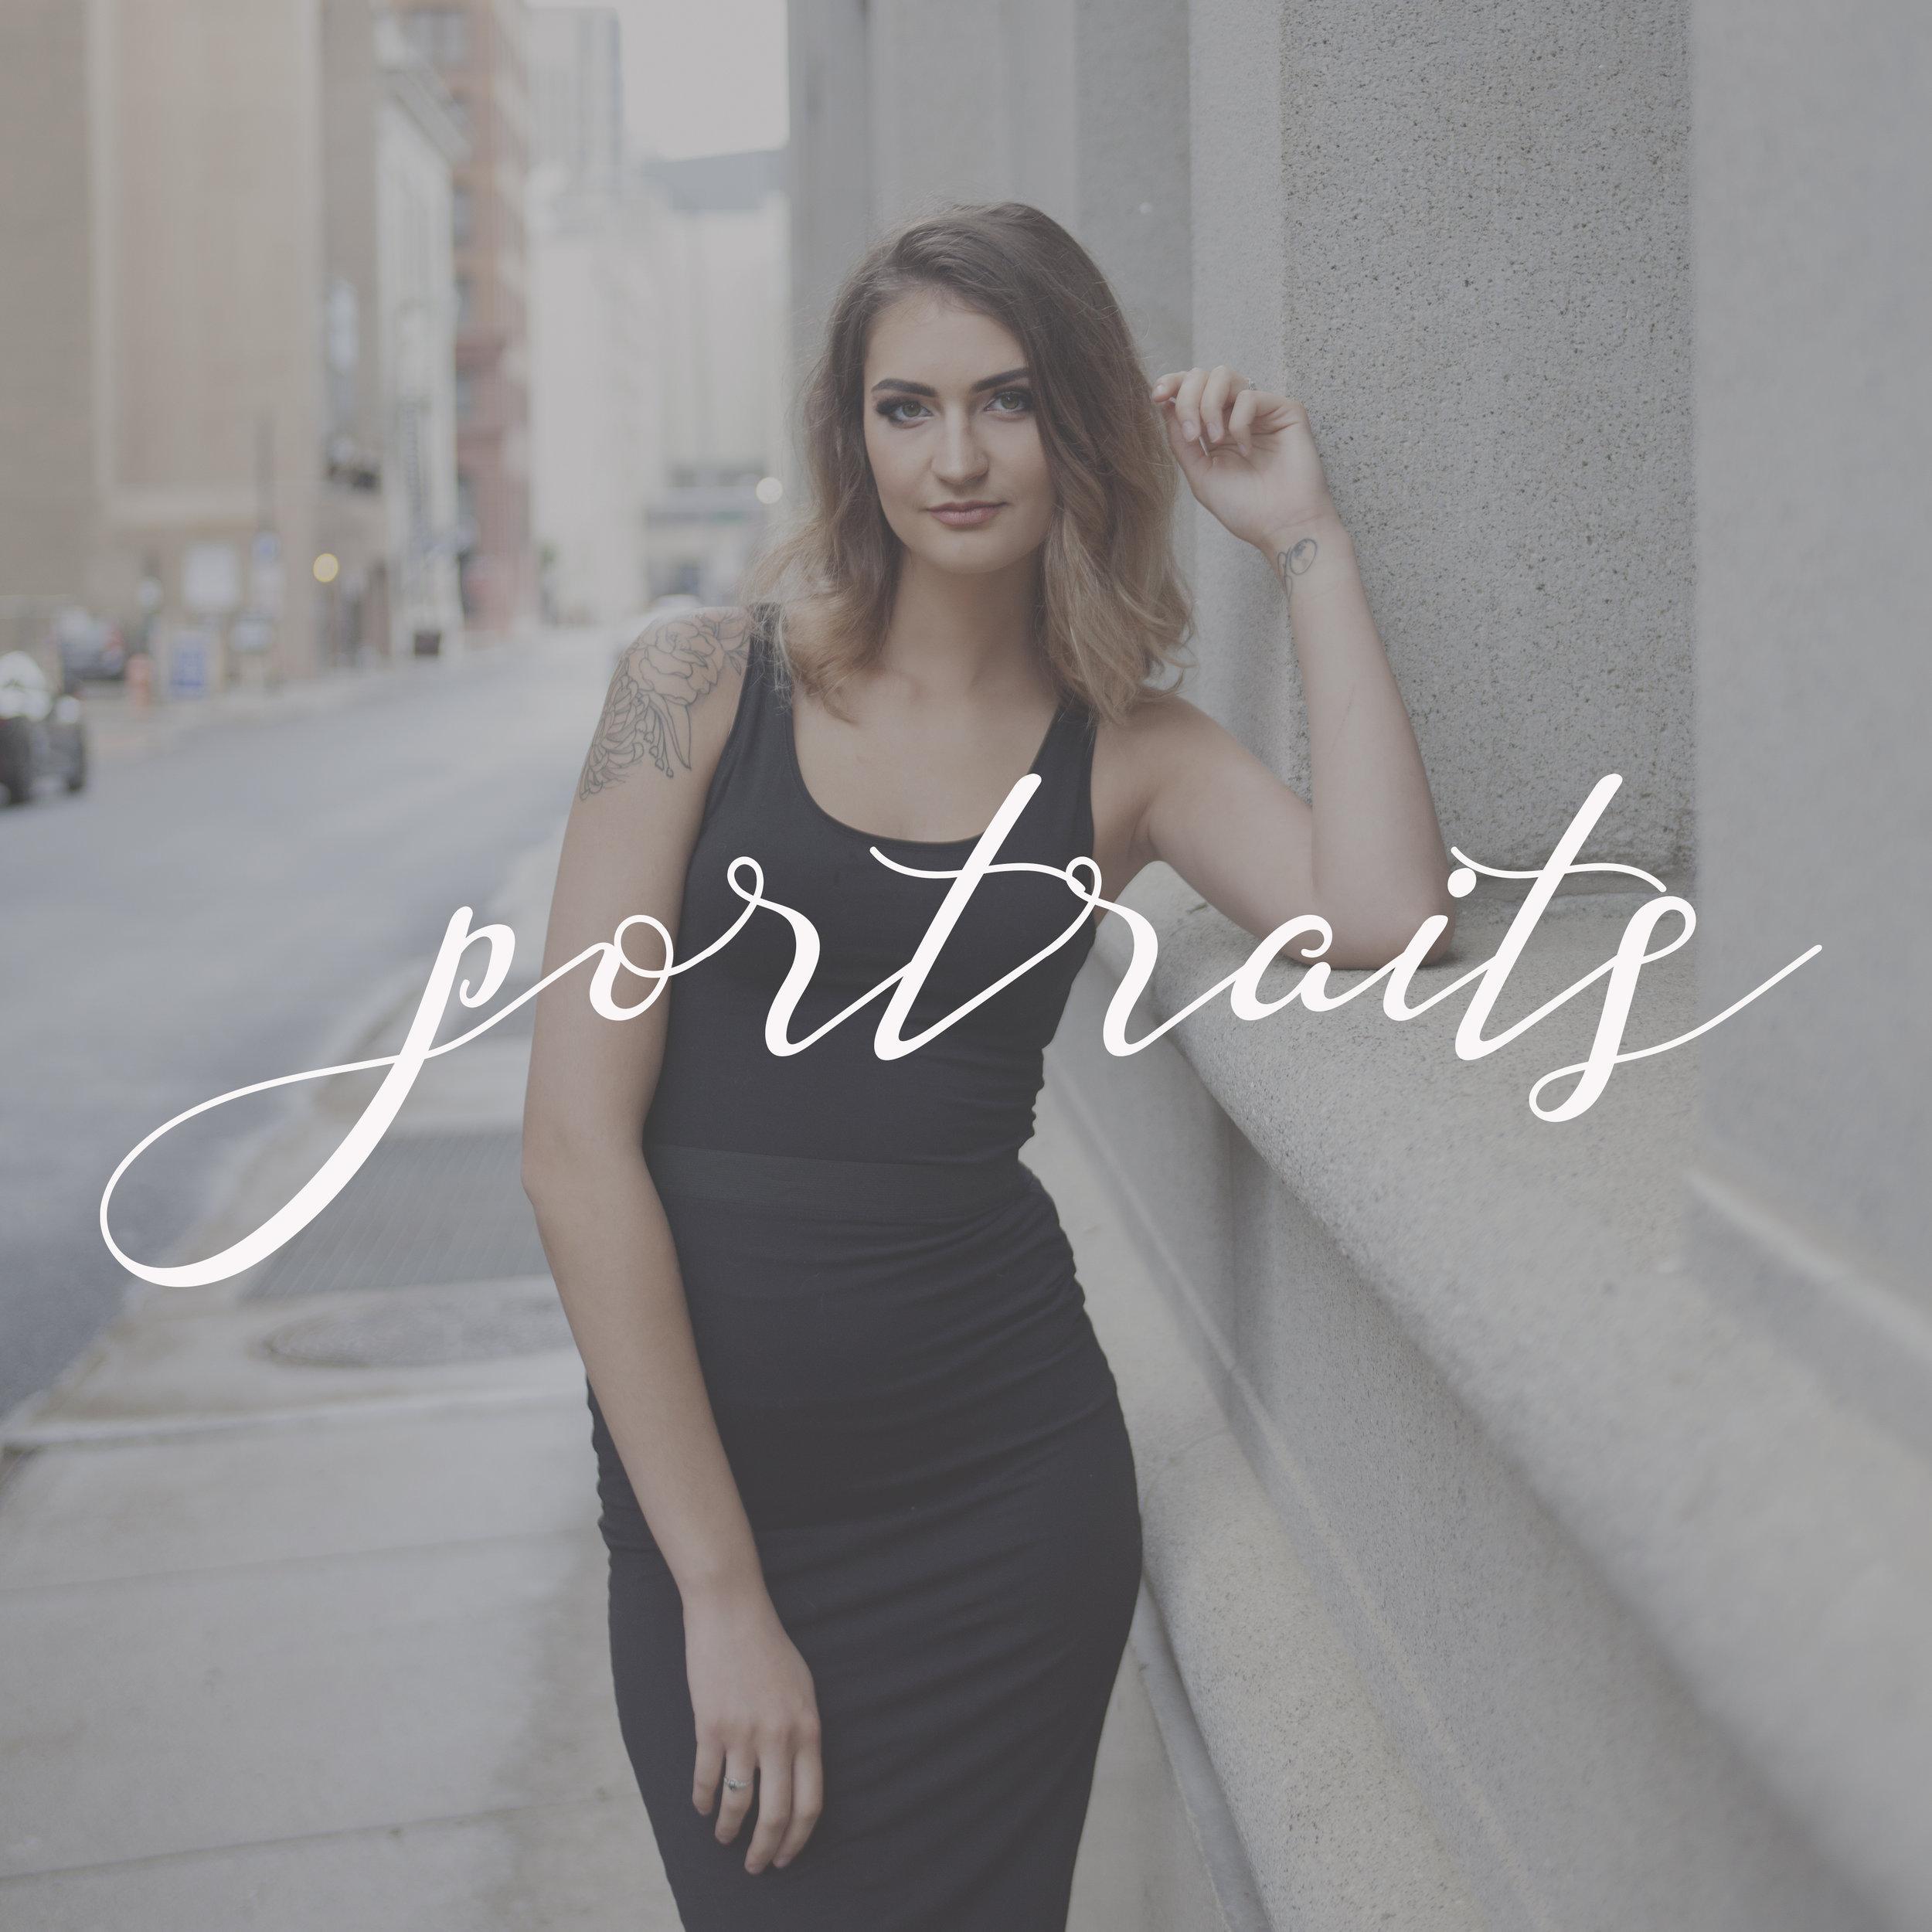 portraitsbutton2.jpg